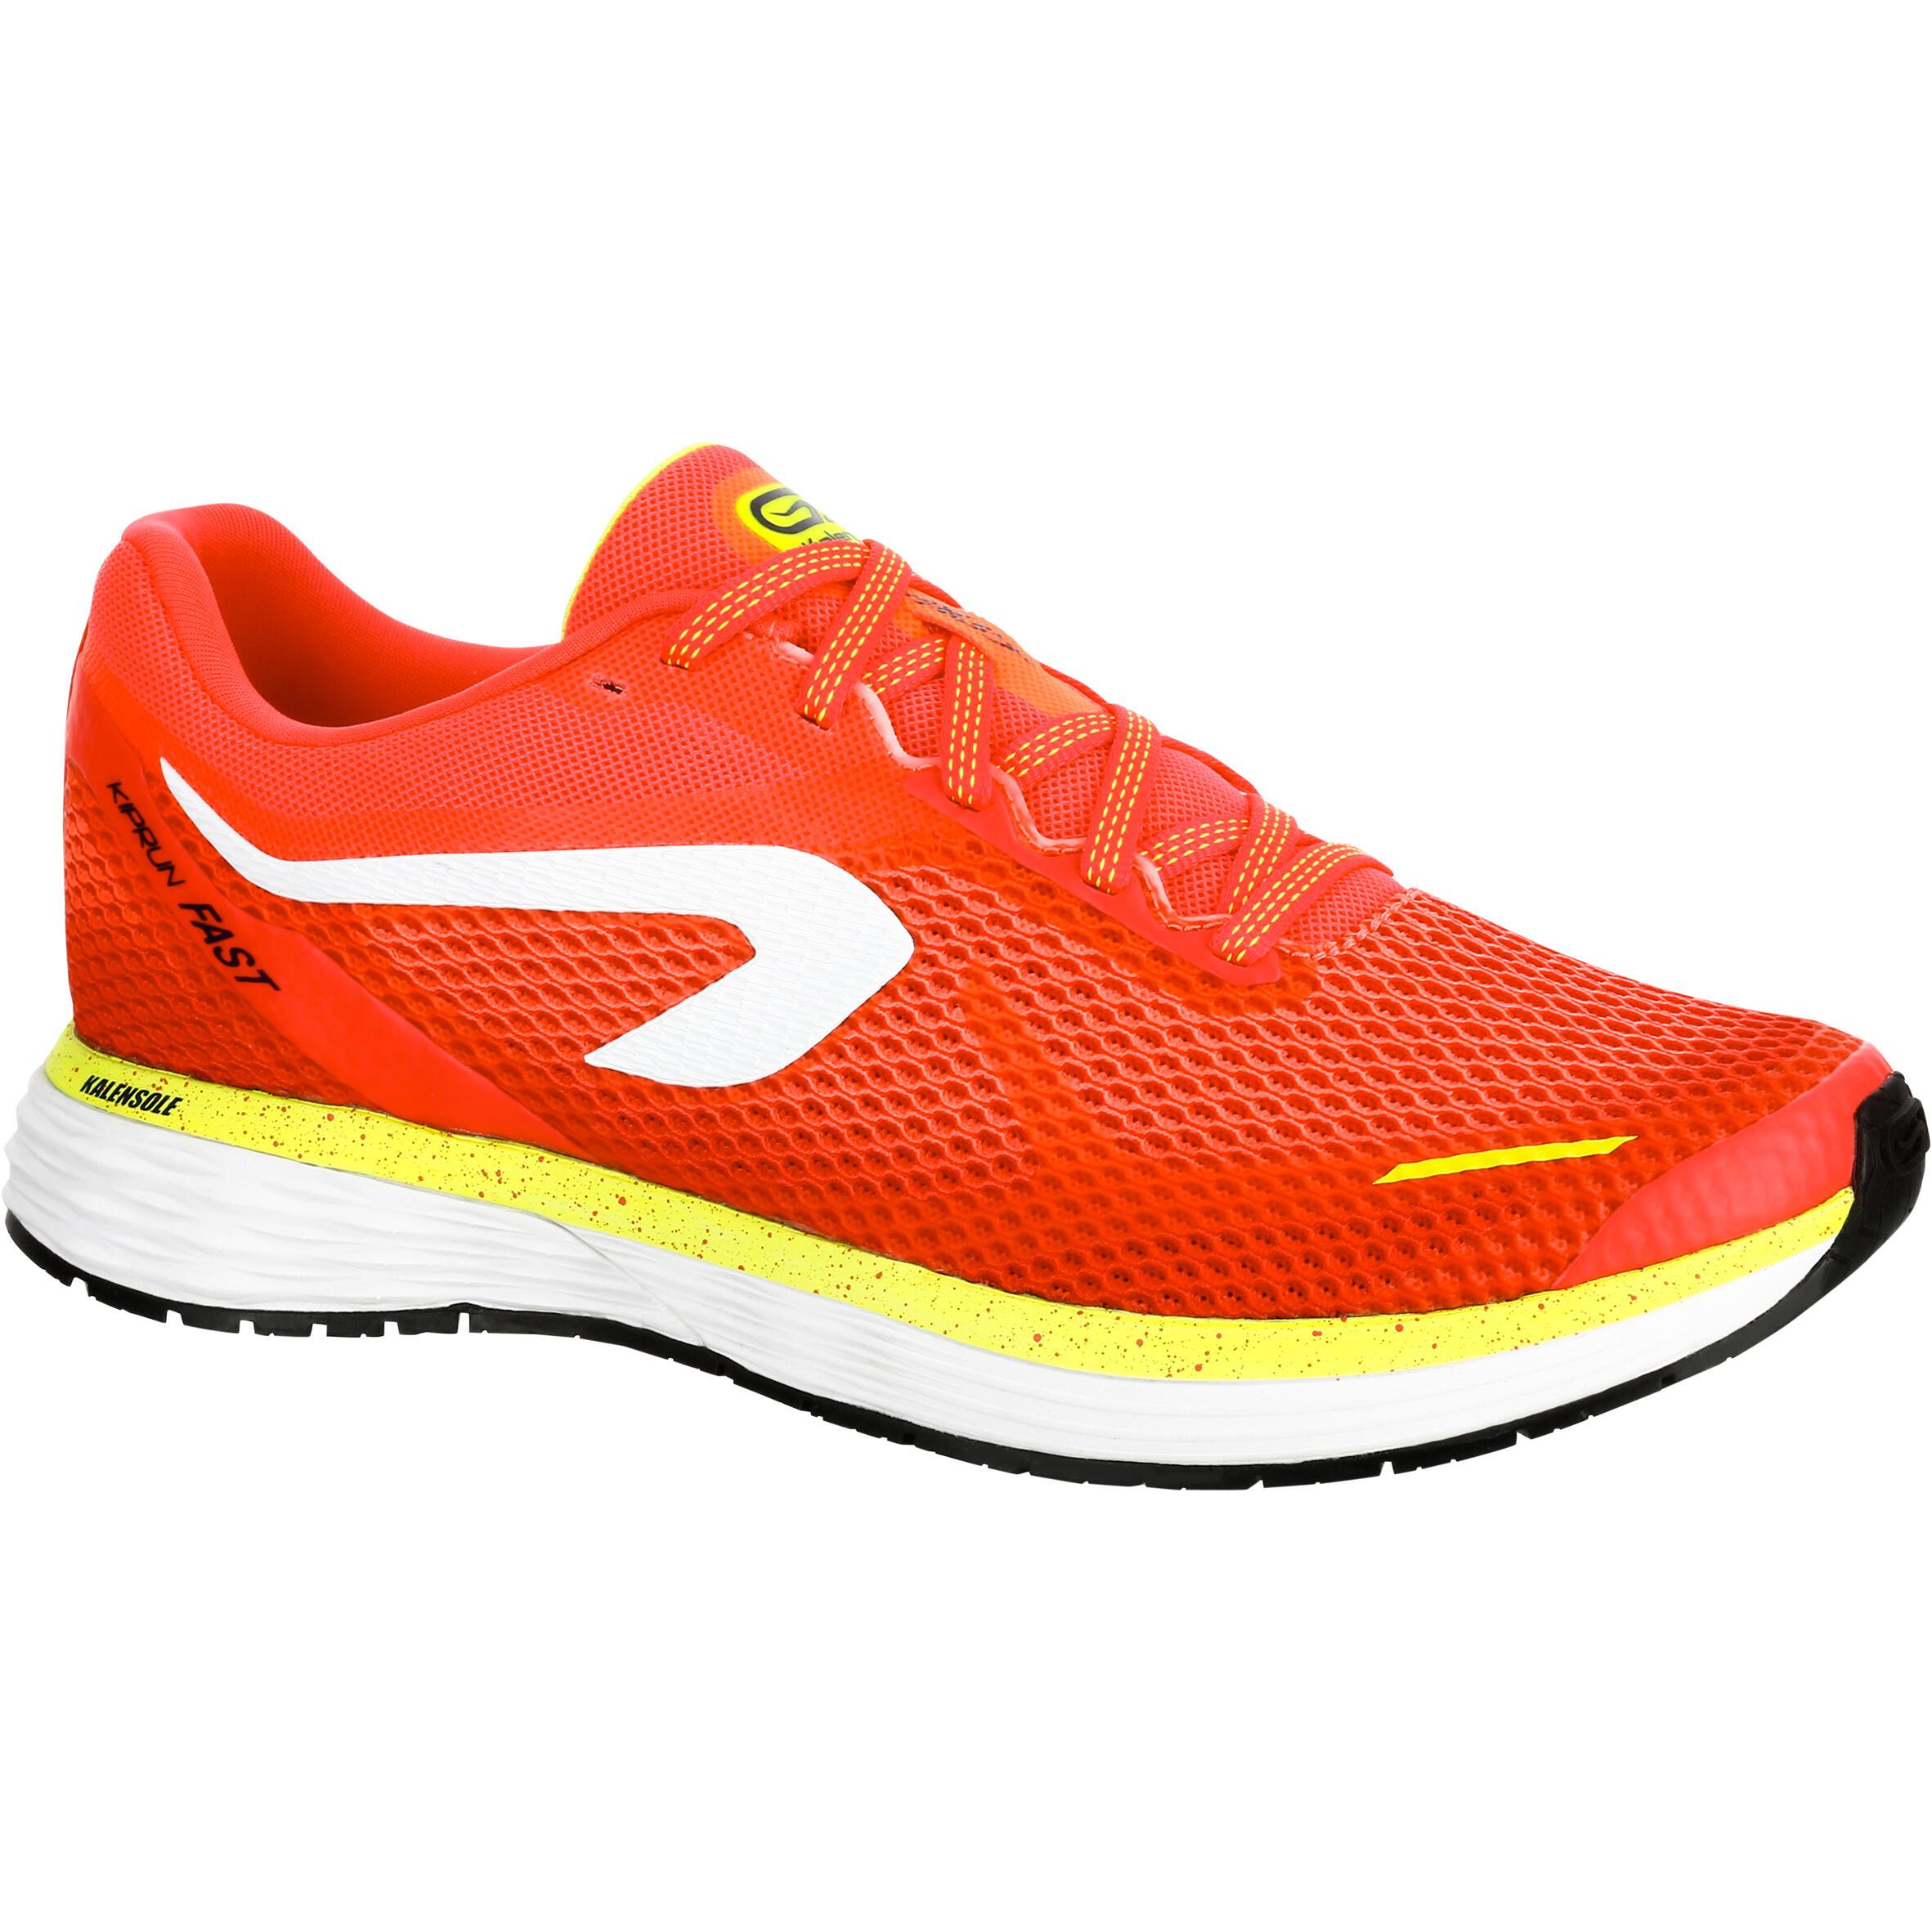 2501878 Kalenji Hardloopschoenen voor dames Kalenji Kiprun Fast koraalrood geel